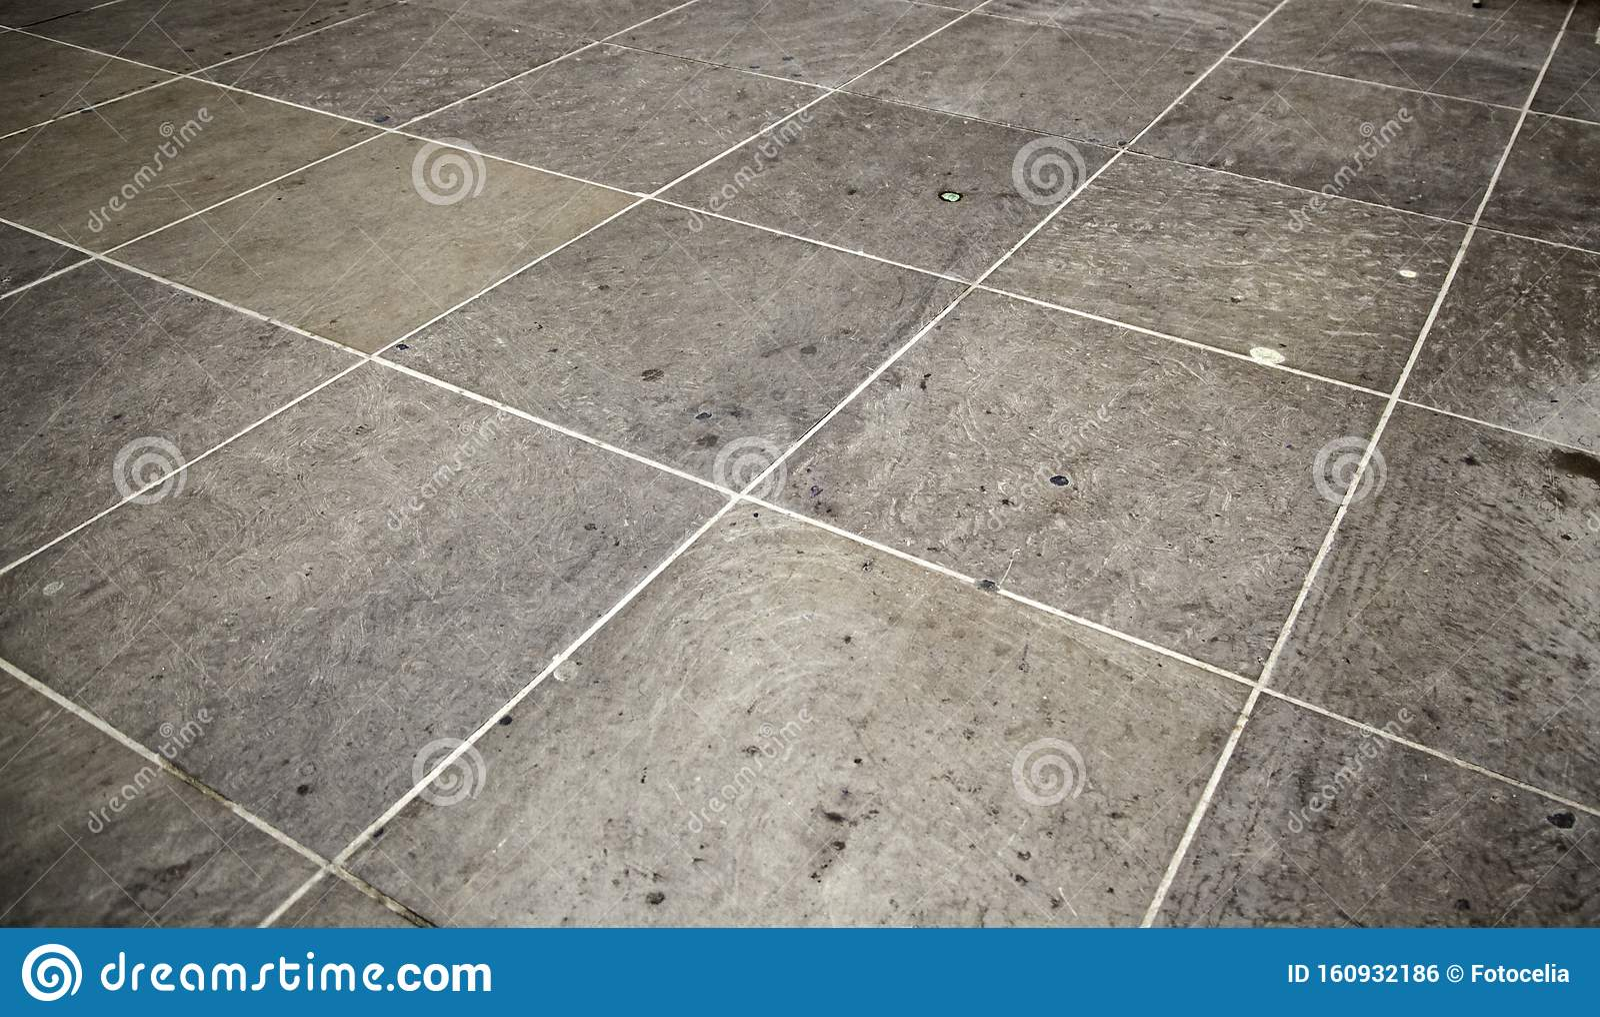 https www dreamstime com floor tile street flooring stone tiles city construction texture paving sidewalk background pattern pavement cement block brick image160932186